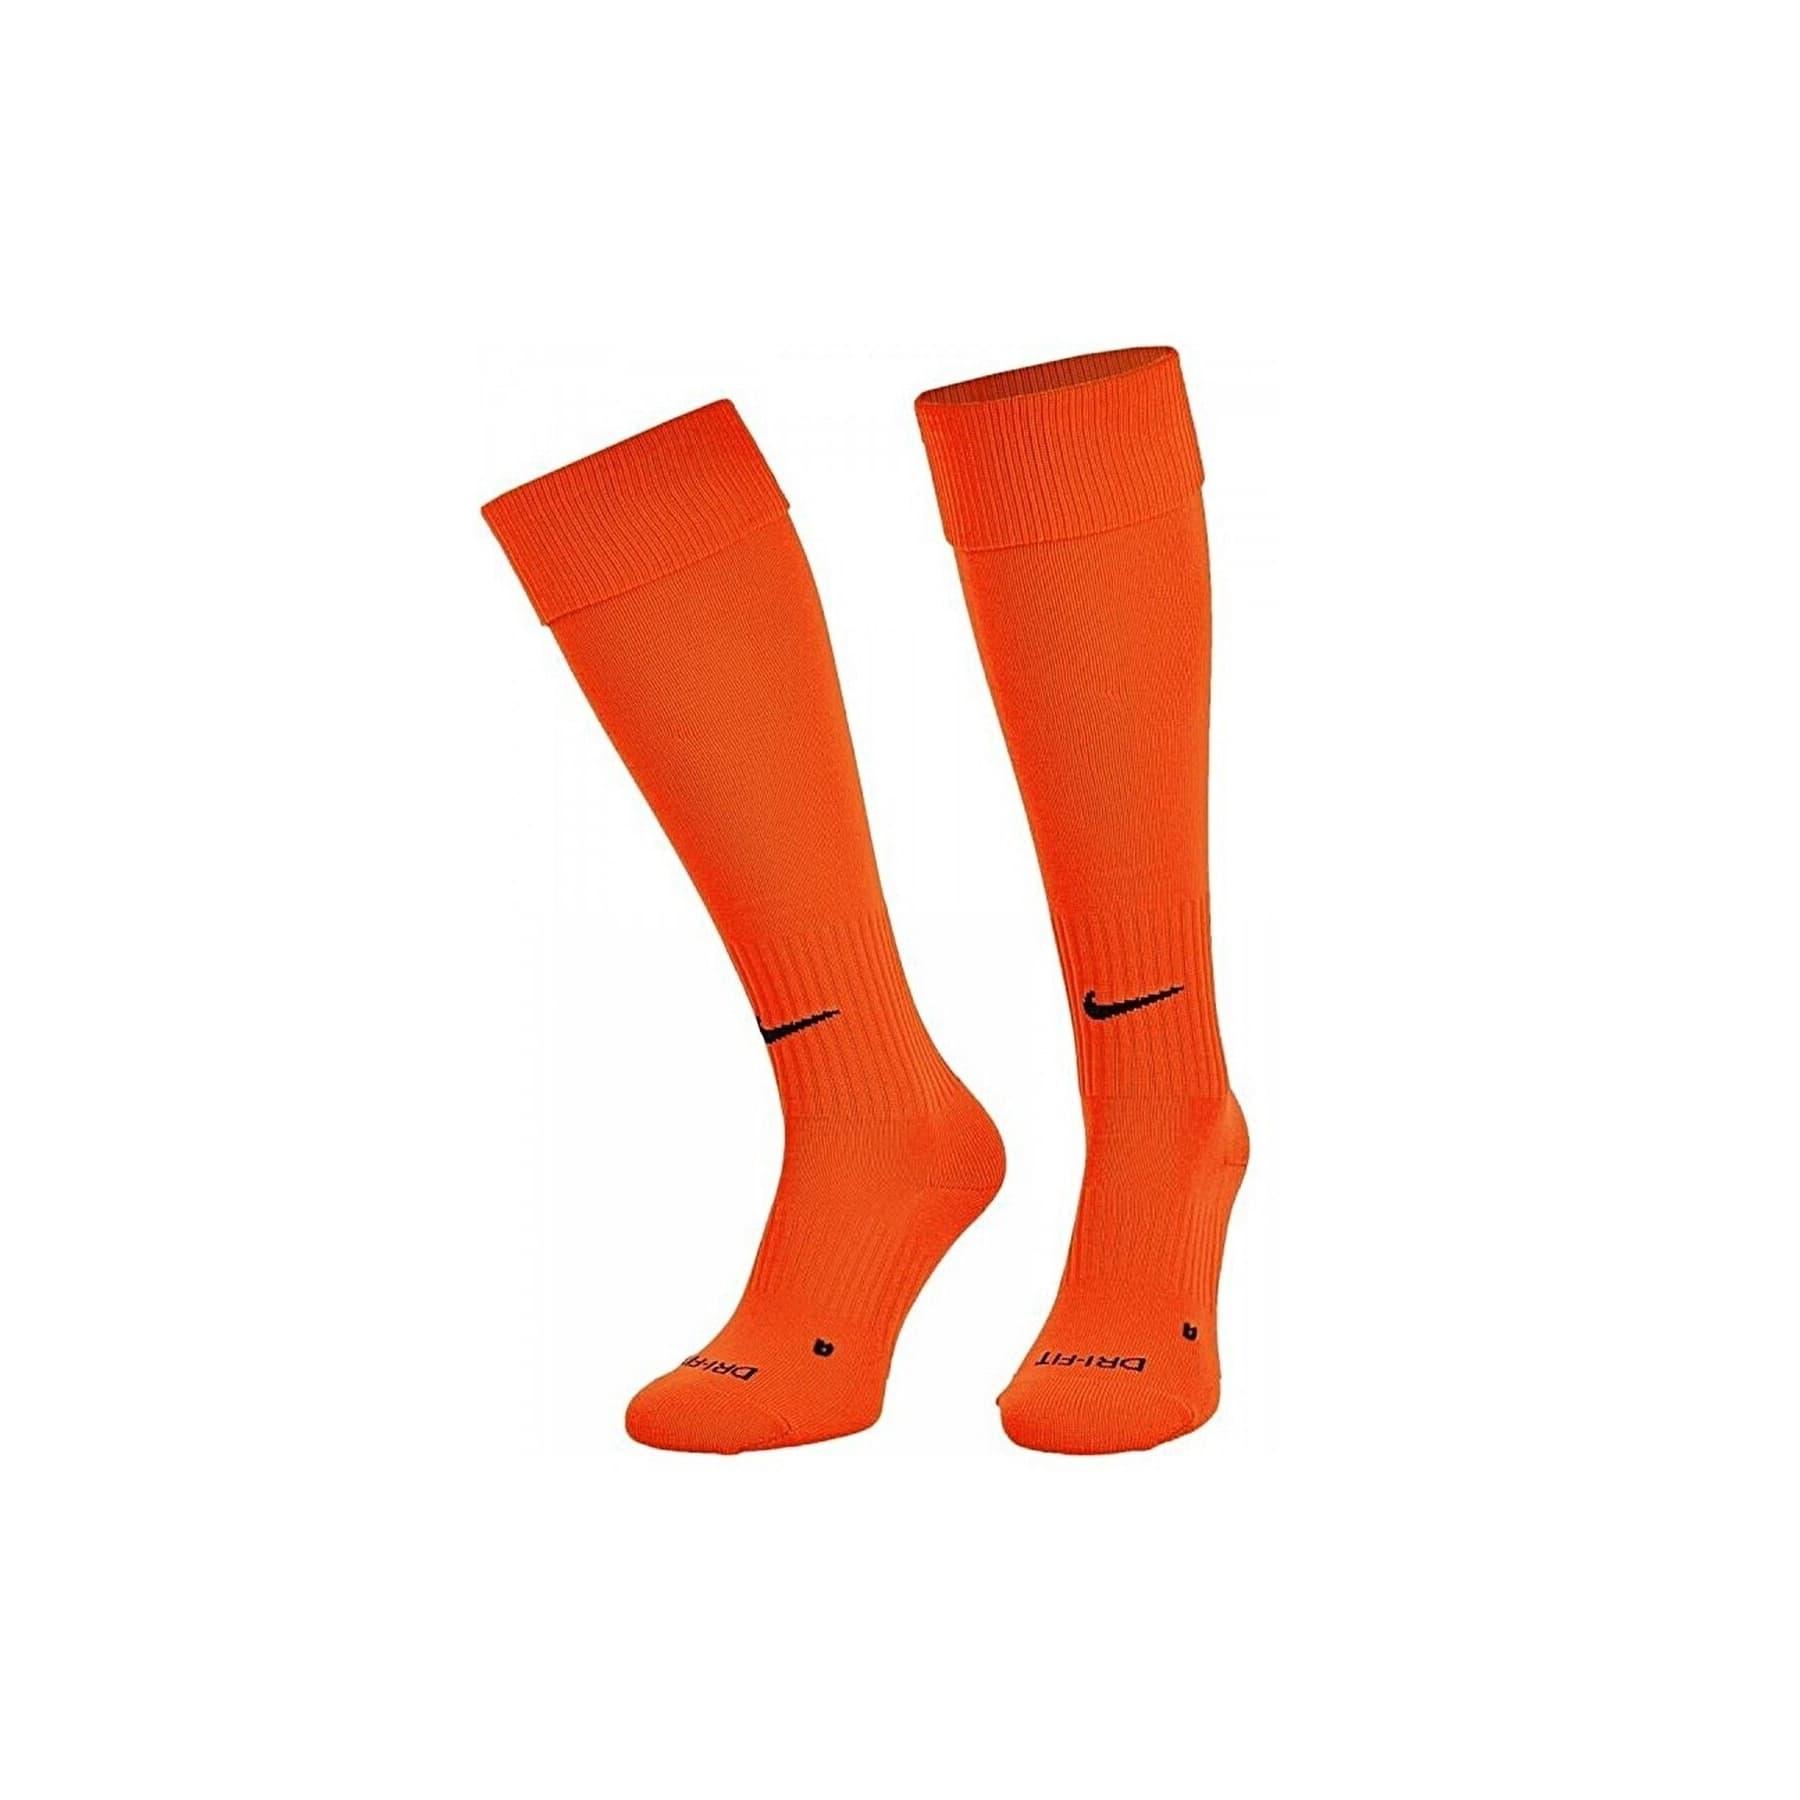 Classic II Cushion Turuncu Futbol Çorabı (SX5728-816)